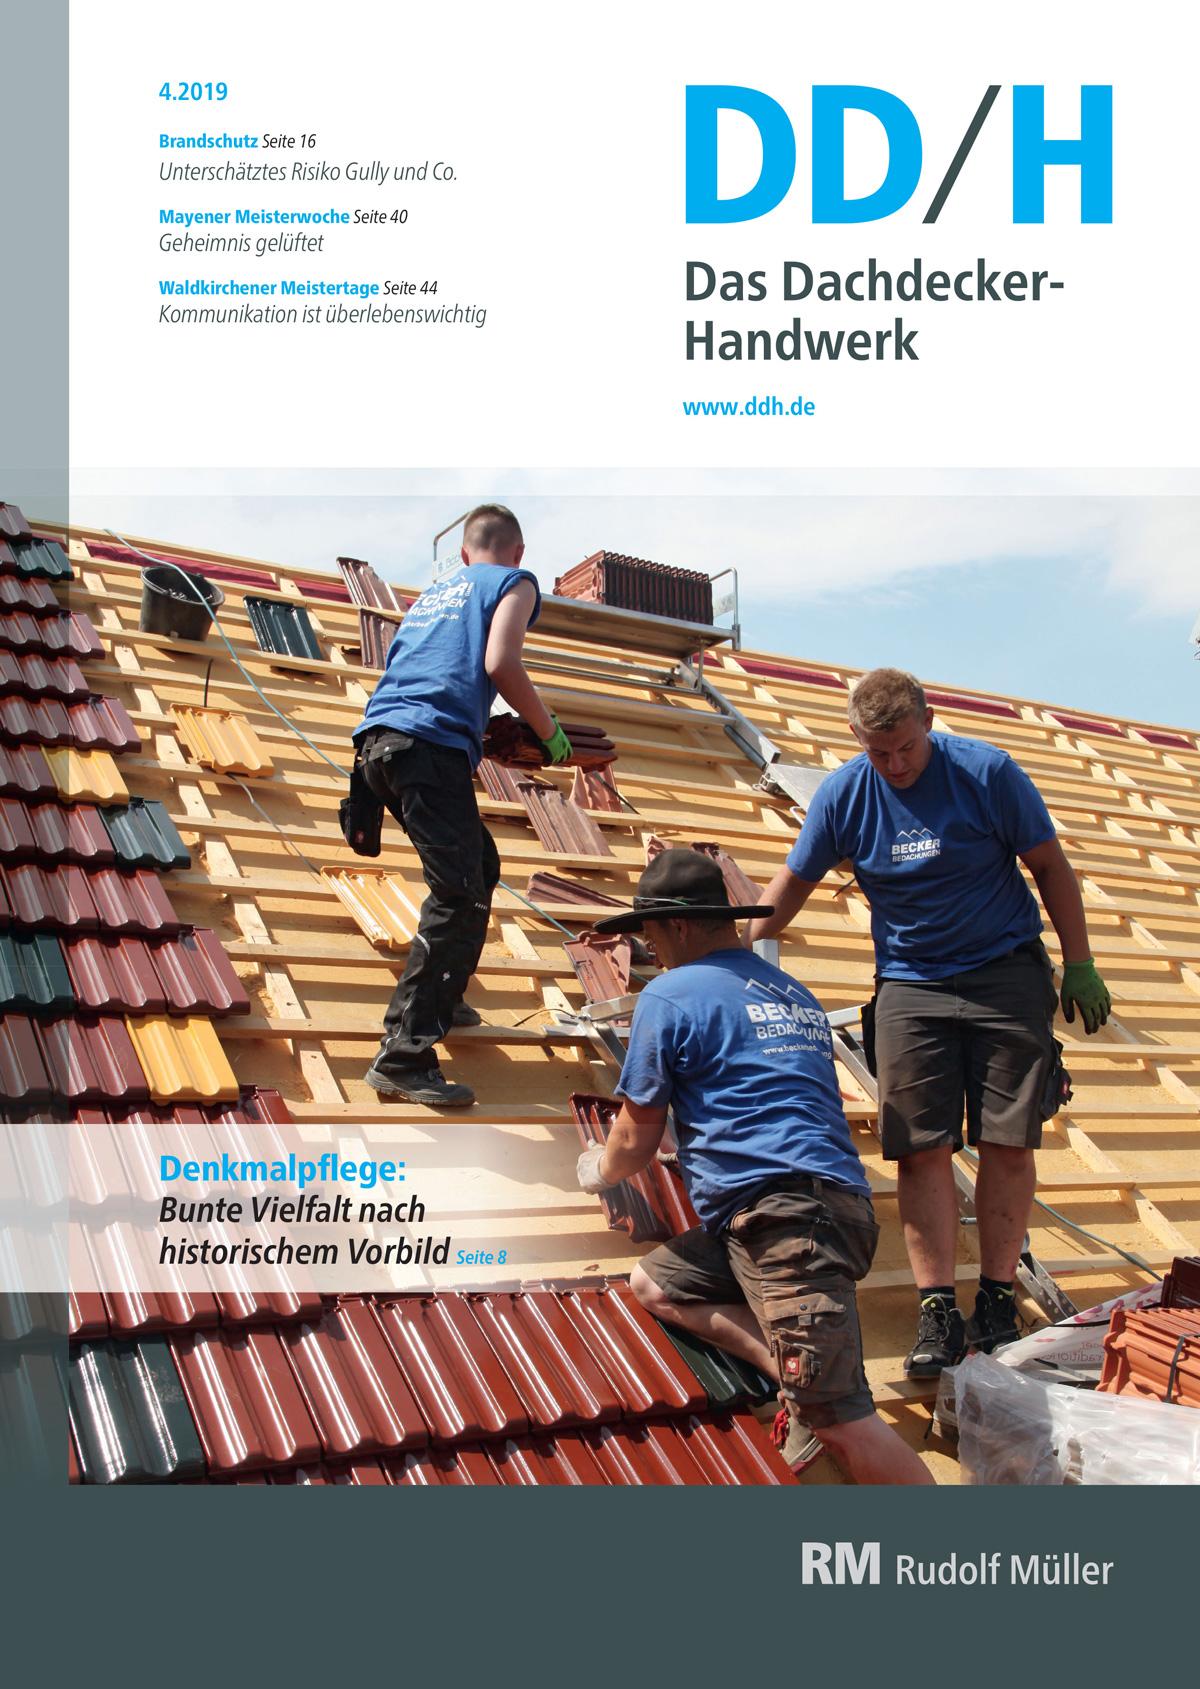 DDH Das Dachdecker-Handwerk